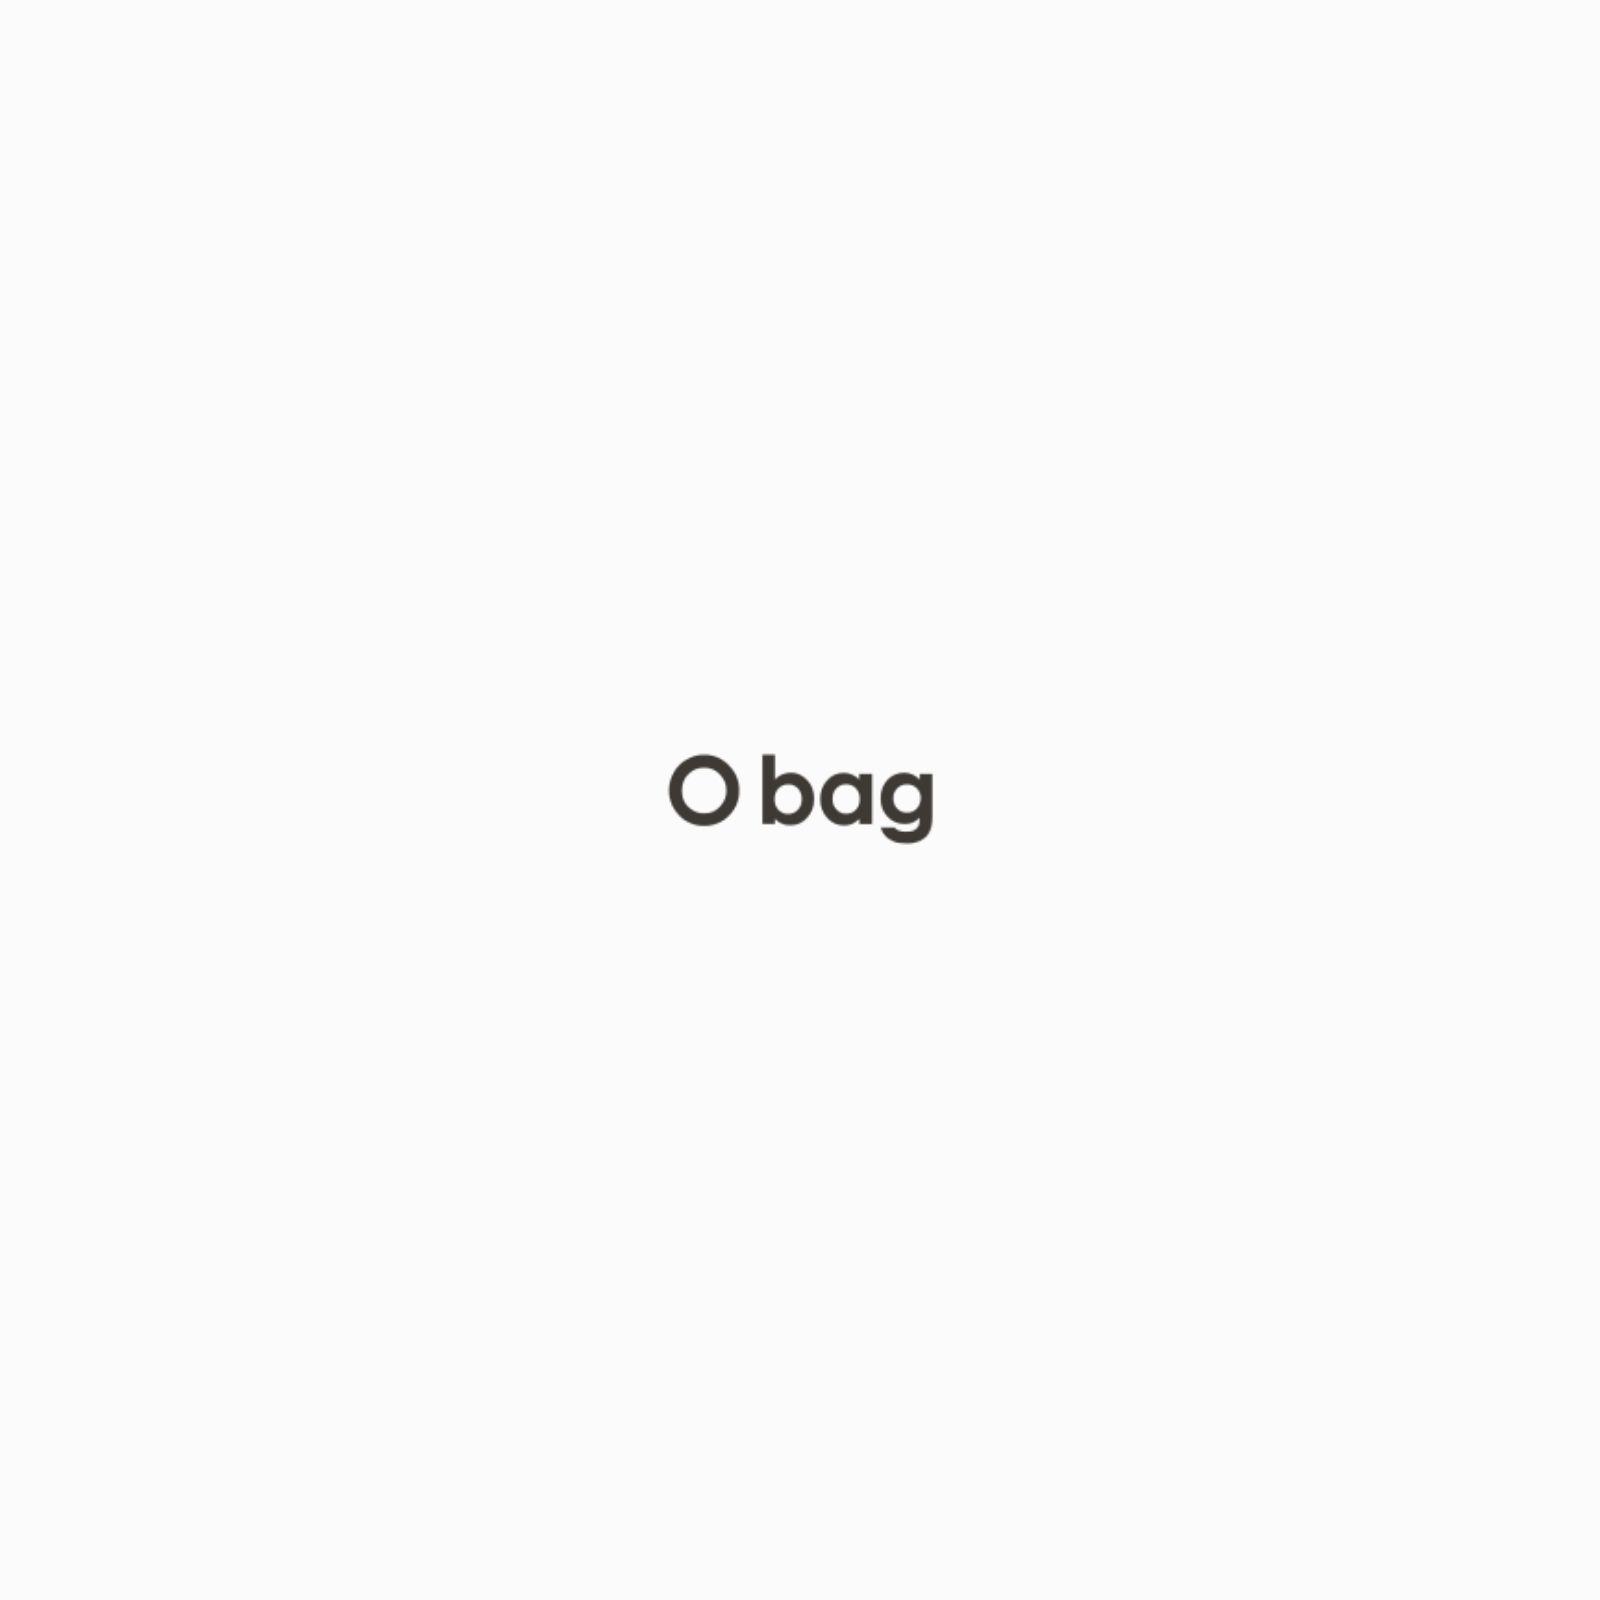 O bag mini   .bobble stitch wool inner bag with drawstring